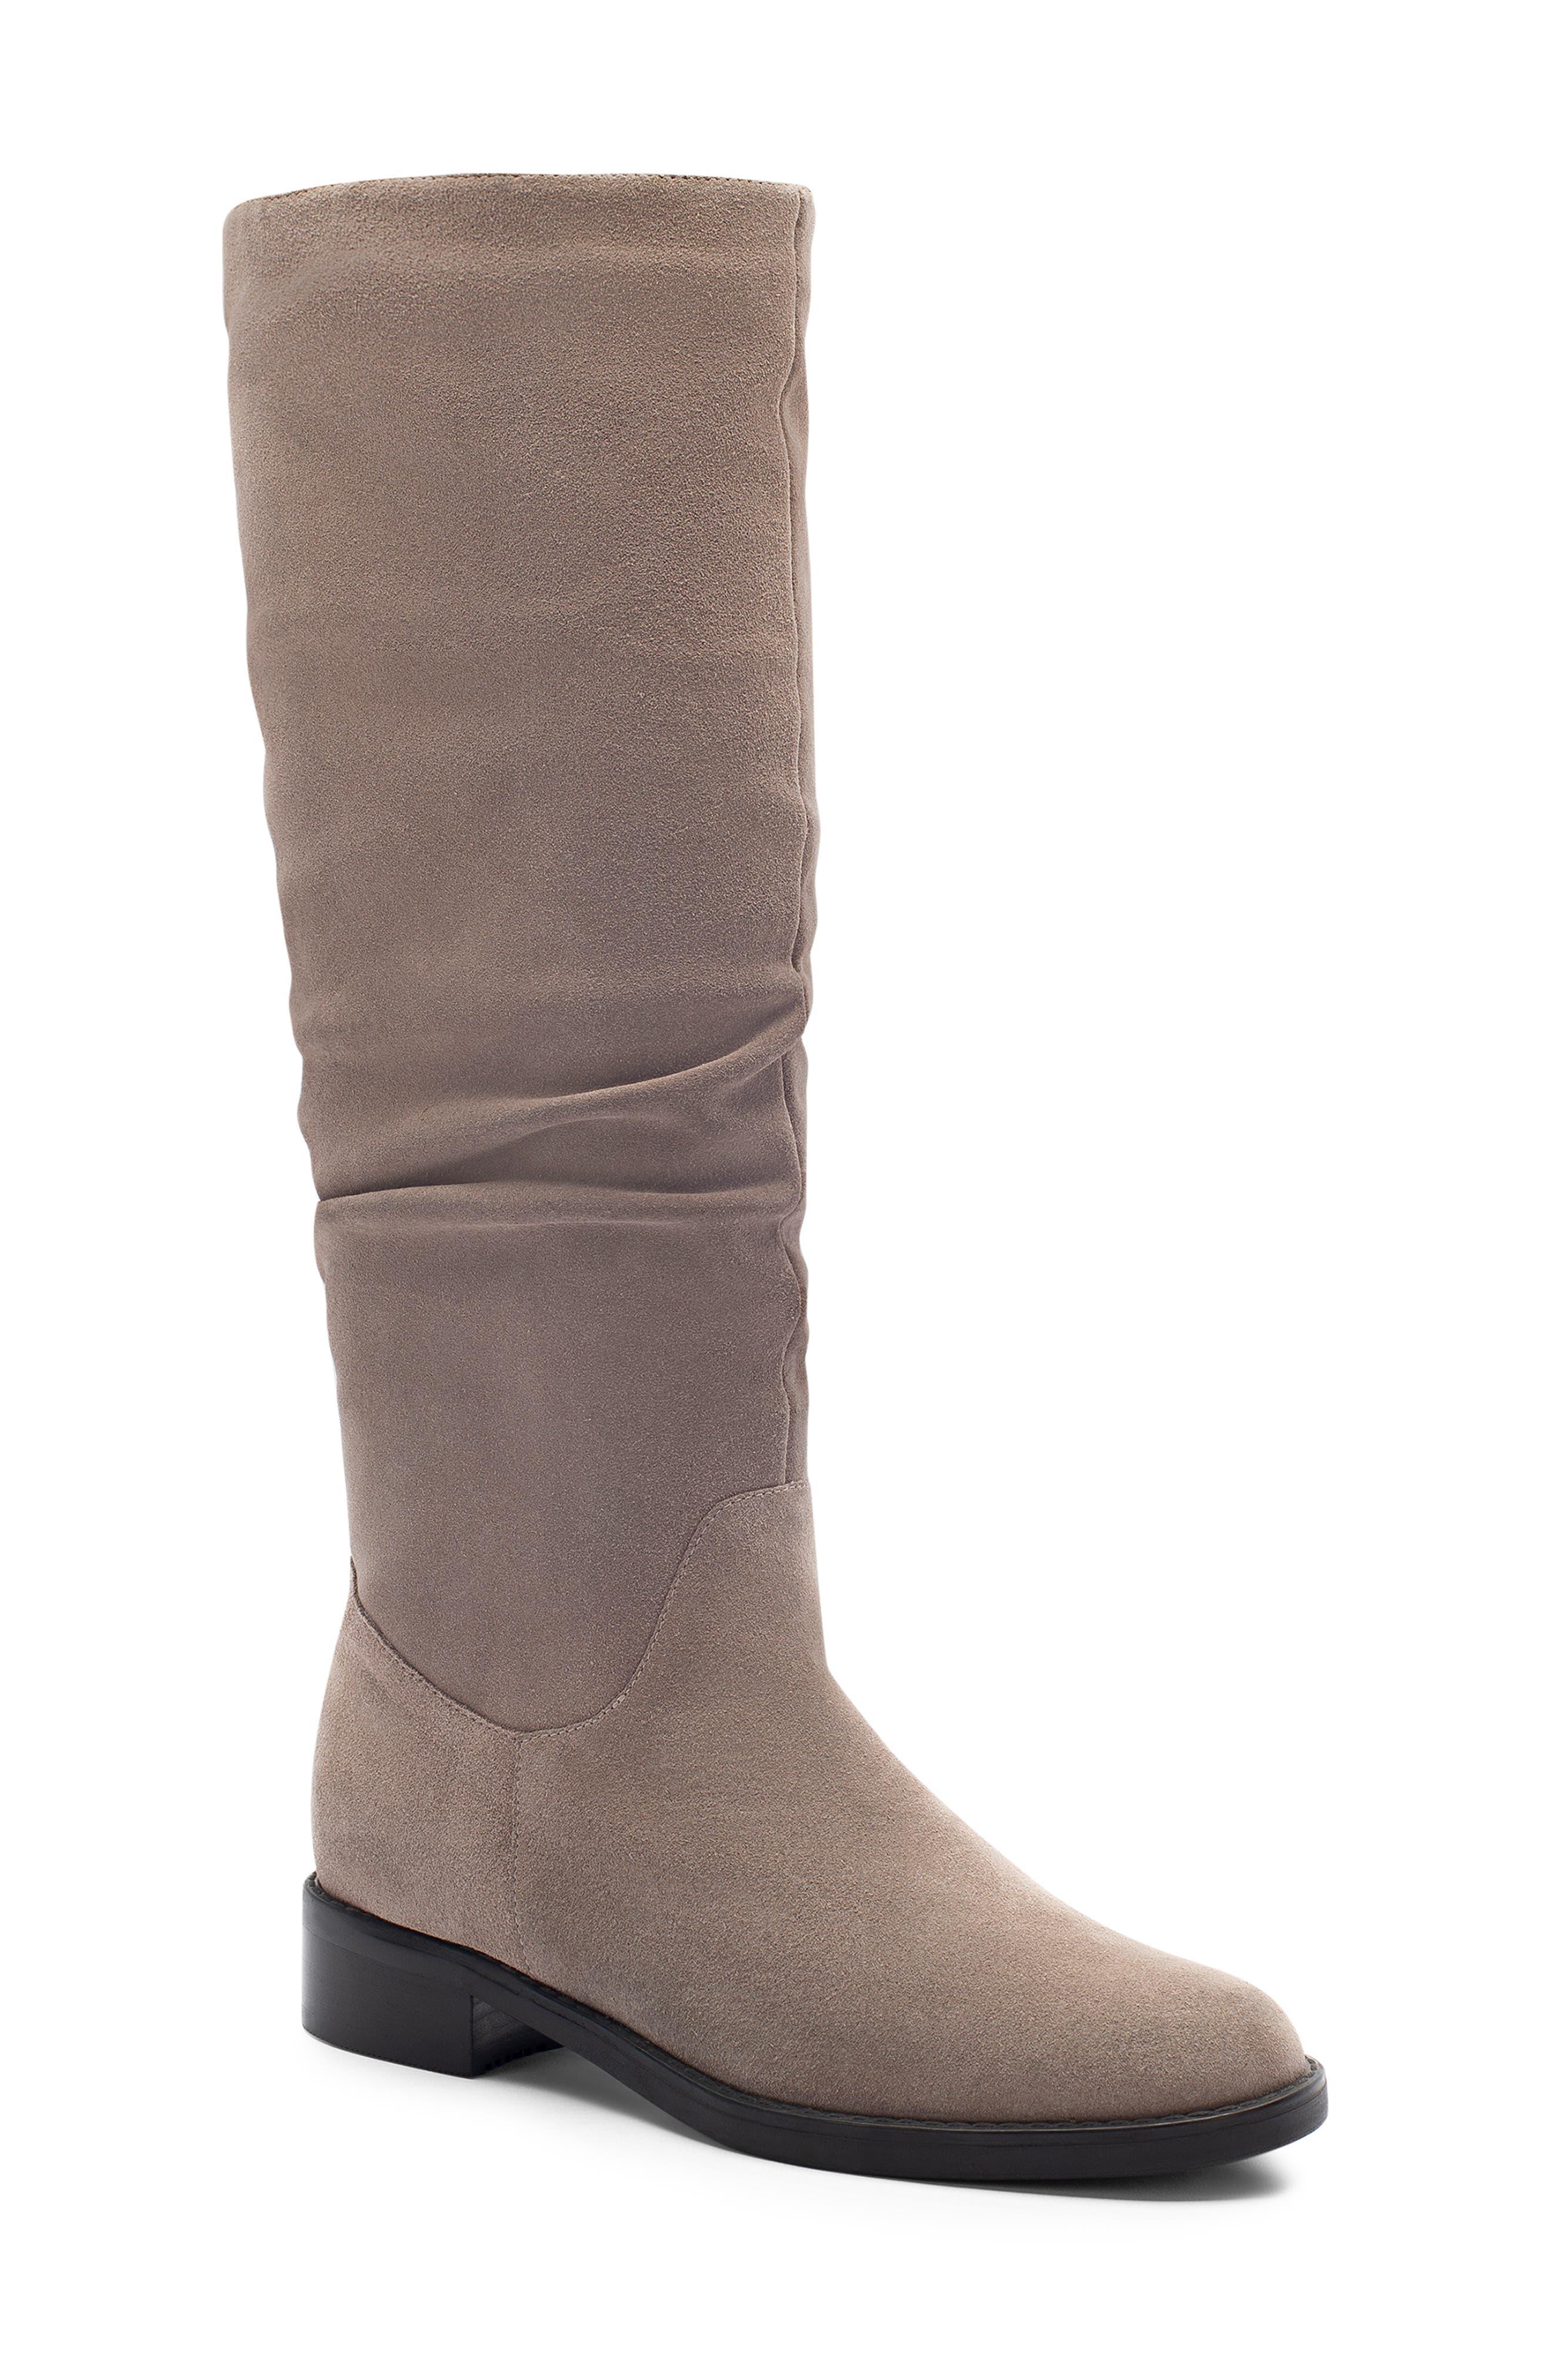 BLONDO, Erika Waterproof Knee High Boot, Main thumbnail 1, color, DARK TAUPE SUEDE